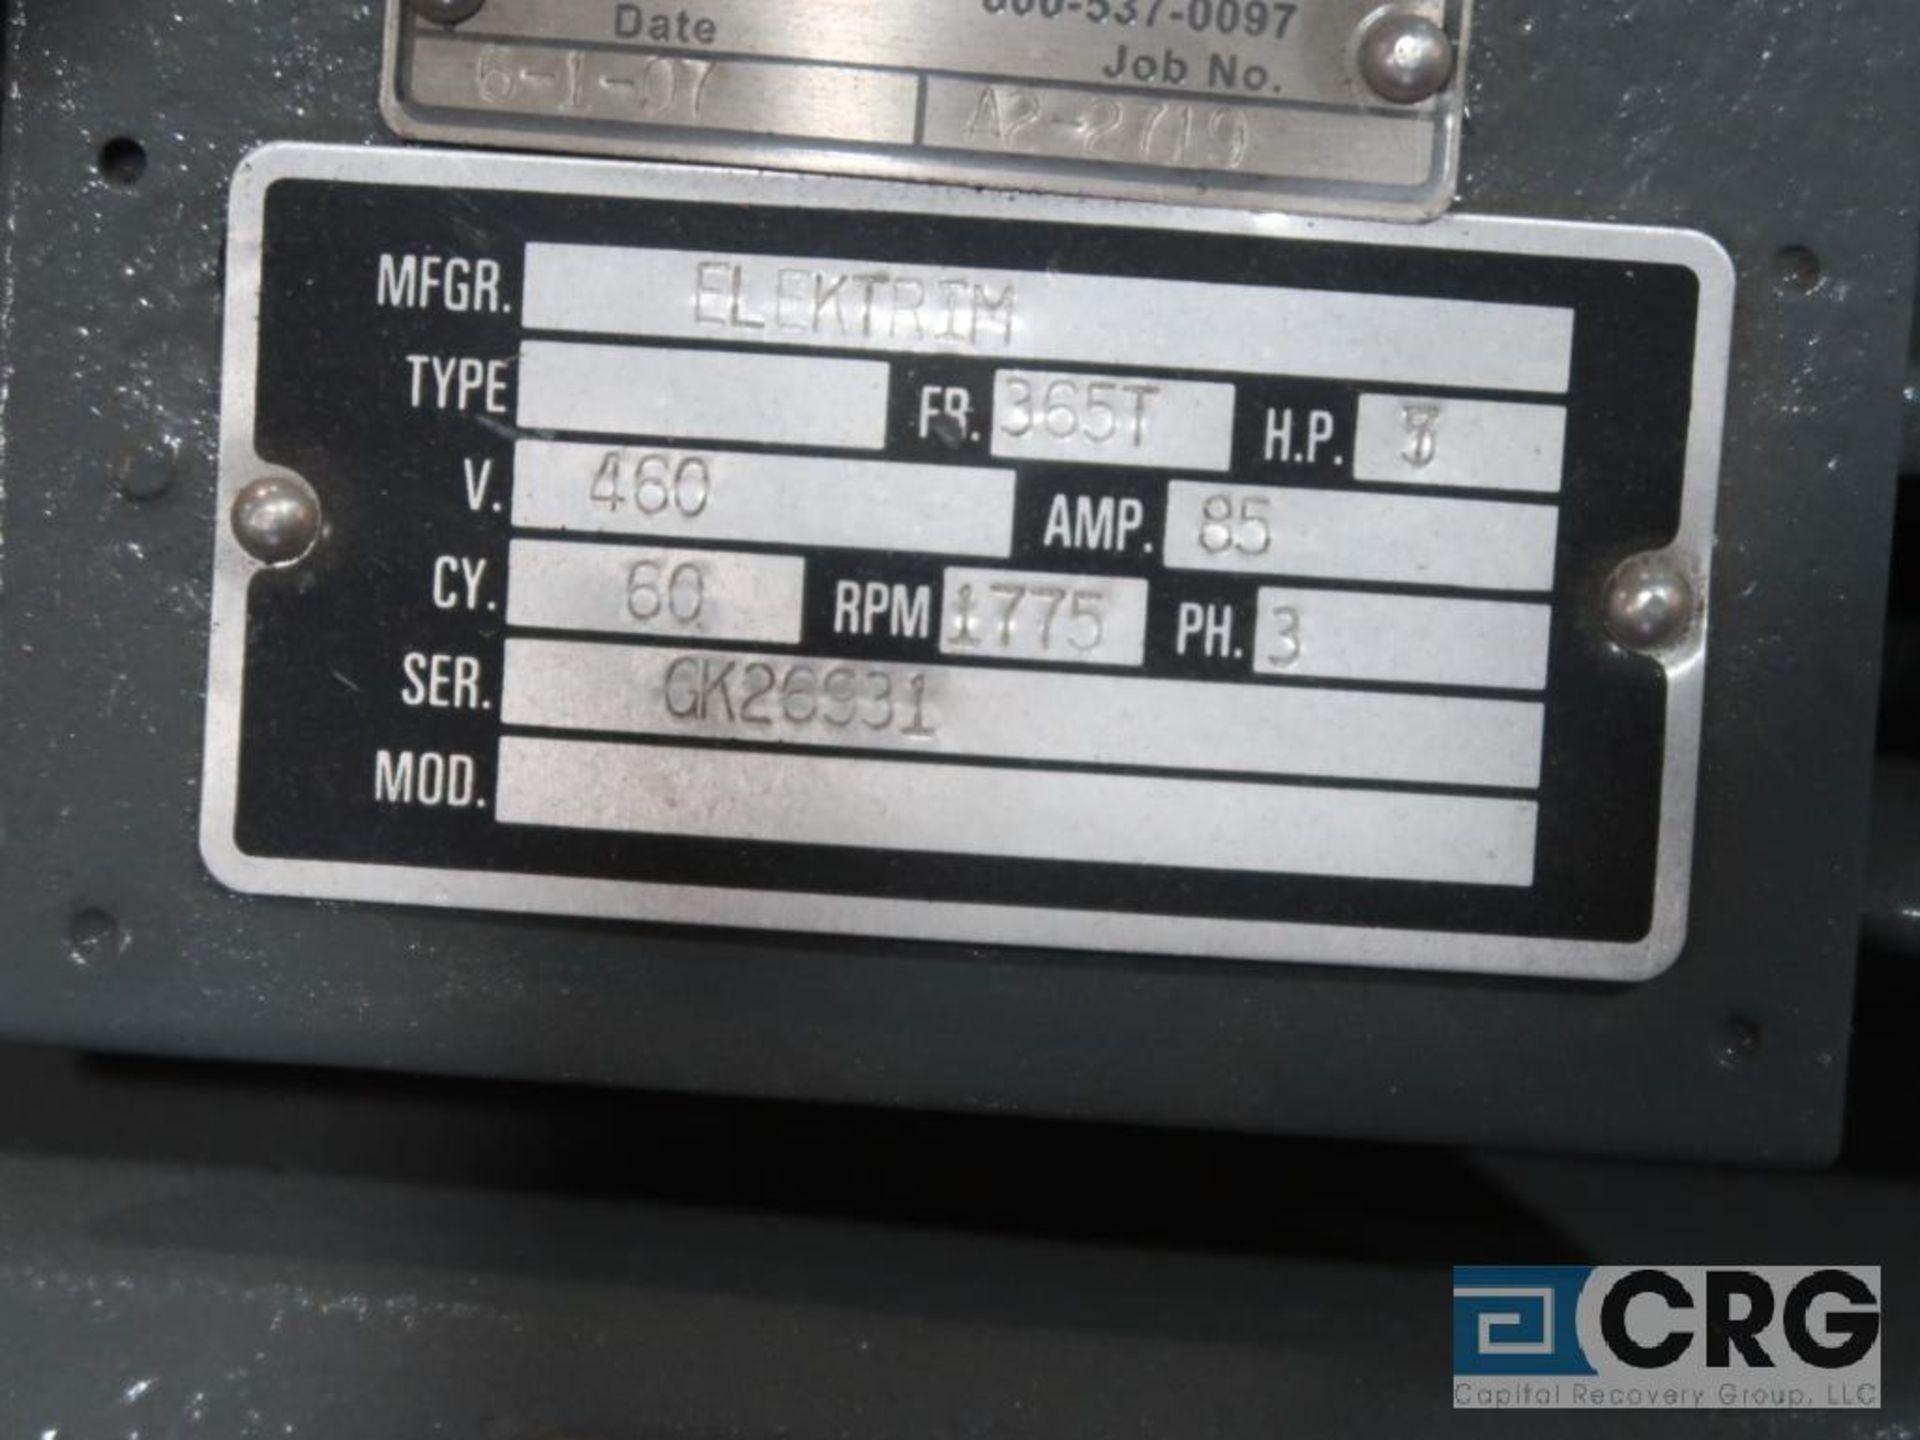 Elektrim electric motor, 75 HP, 1,775 RPMs, 460 volt, 3 ph., 365T frame (Finish Building) - Image 2 of 2